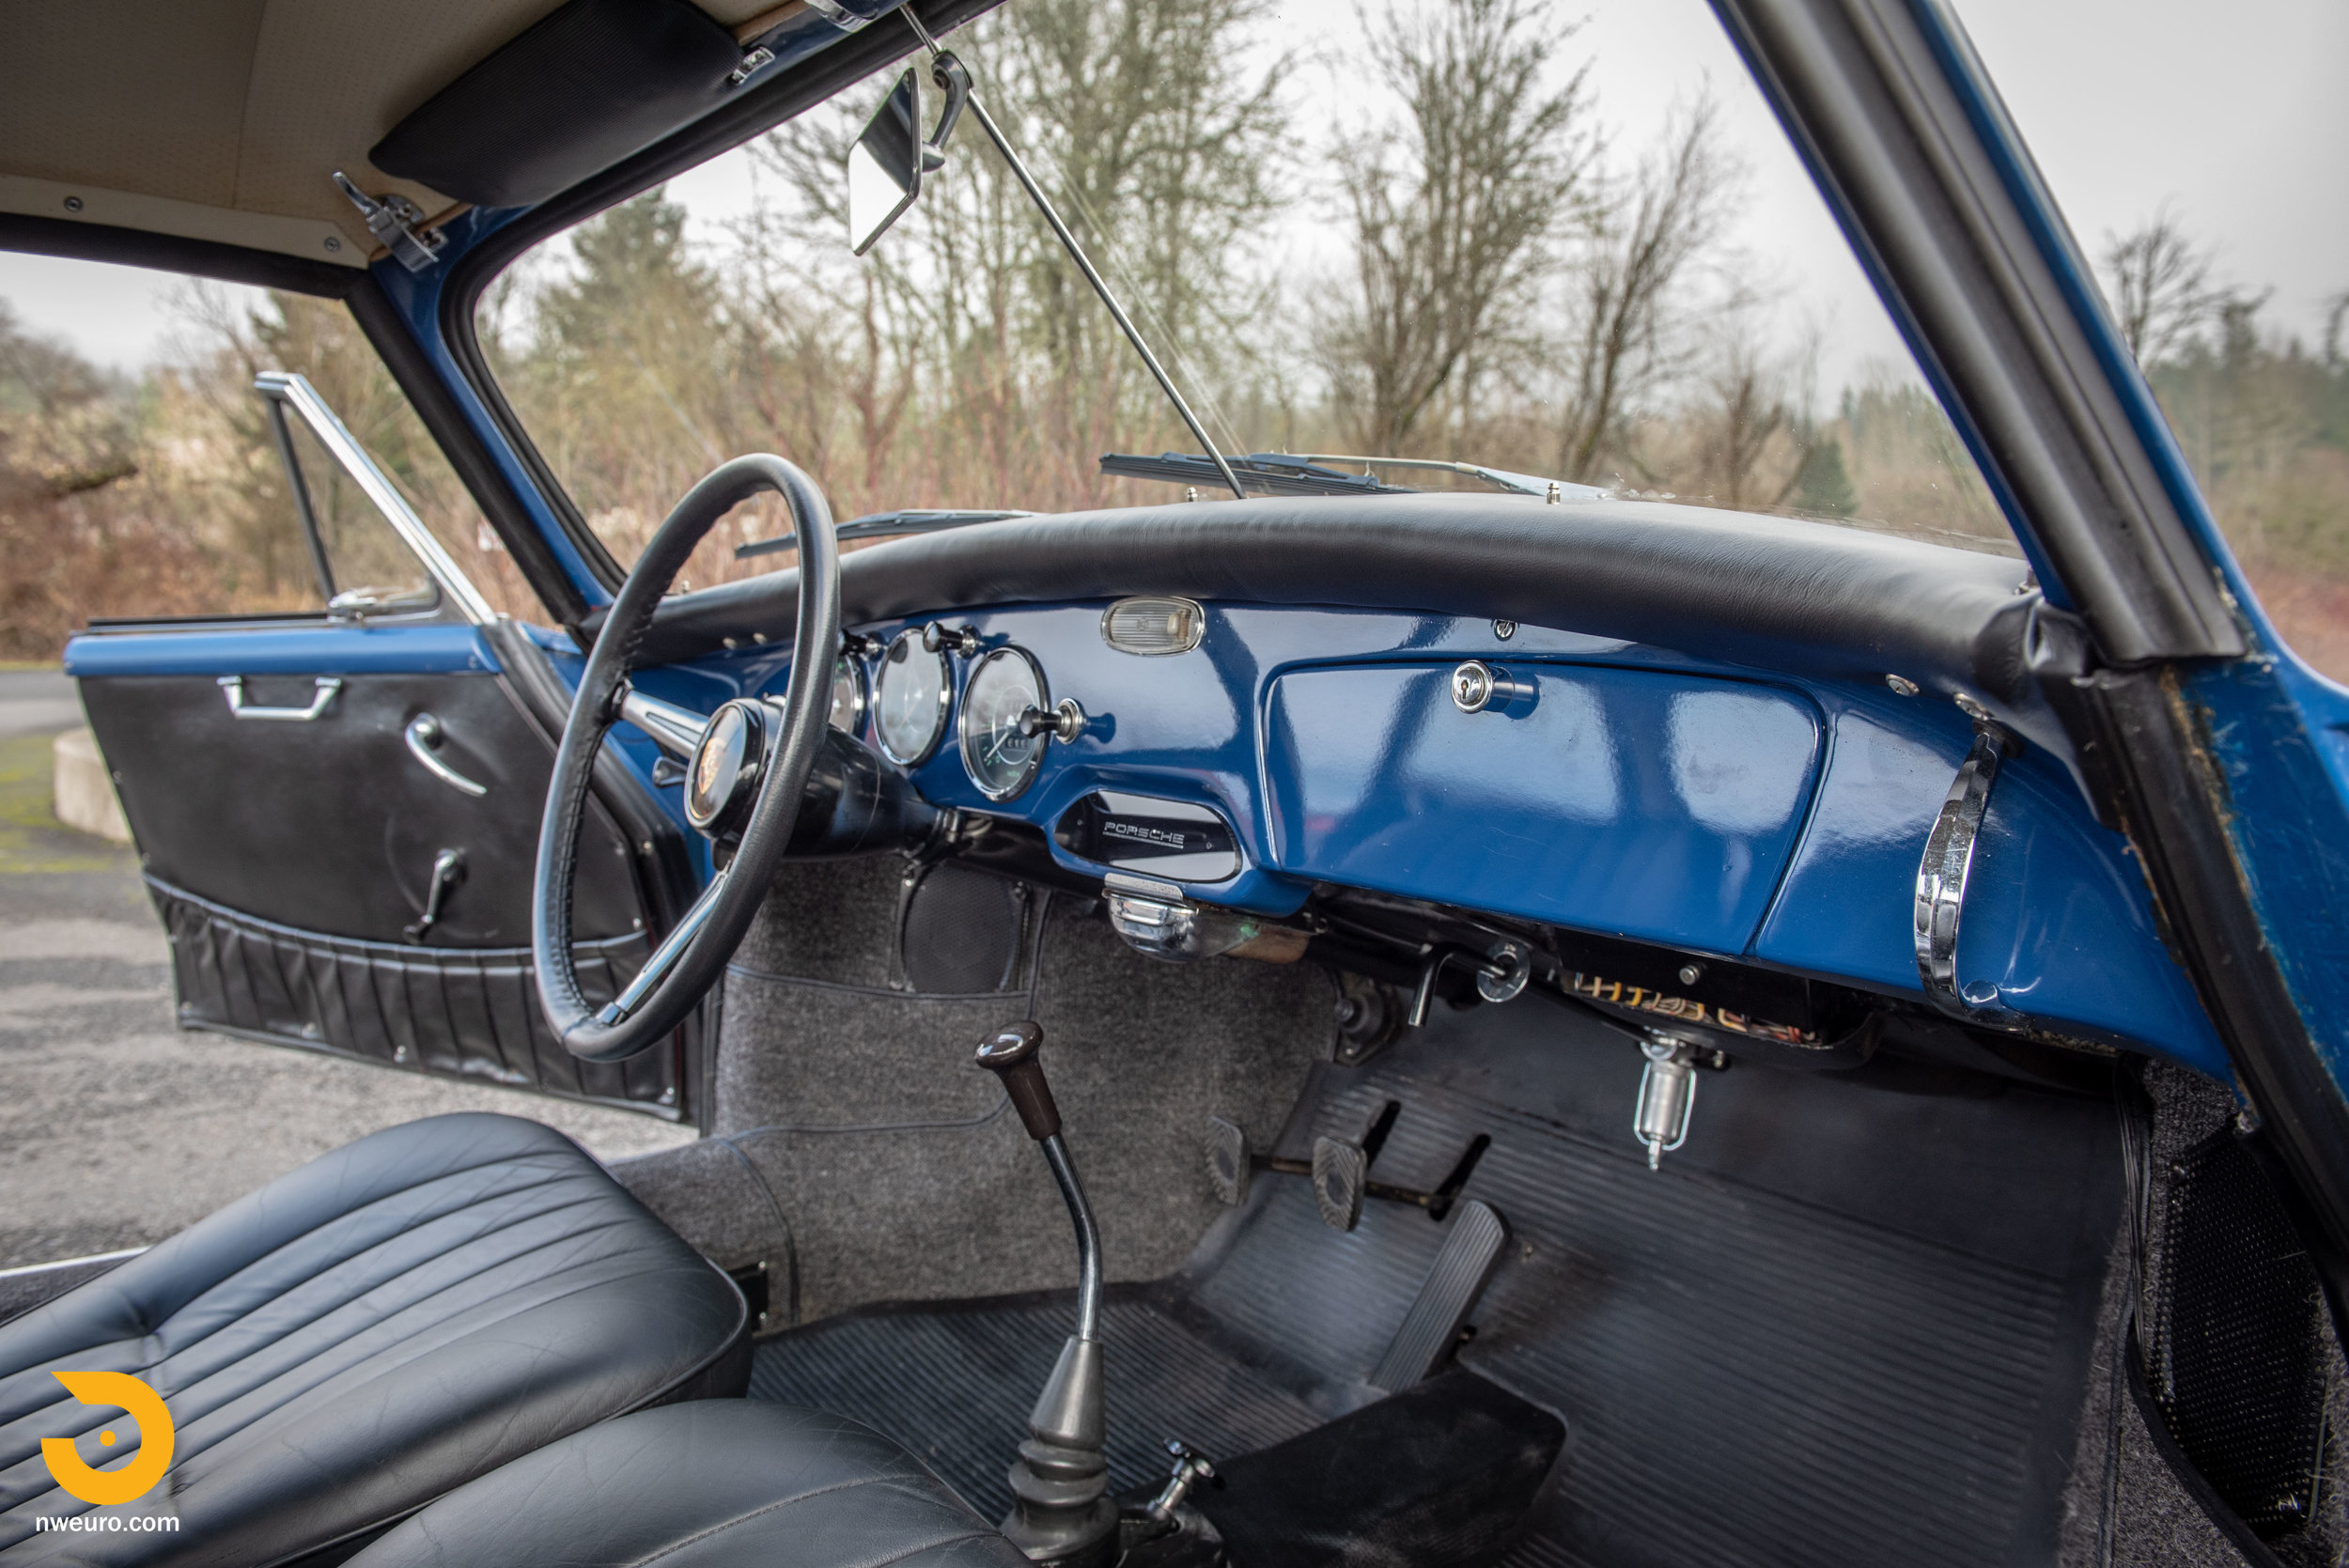 1960 Porsche 356 Hardtop Cab 1600 Super-74.jpg